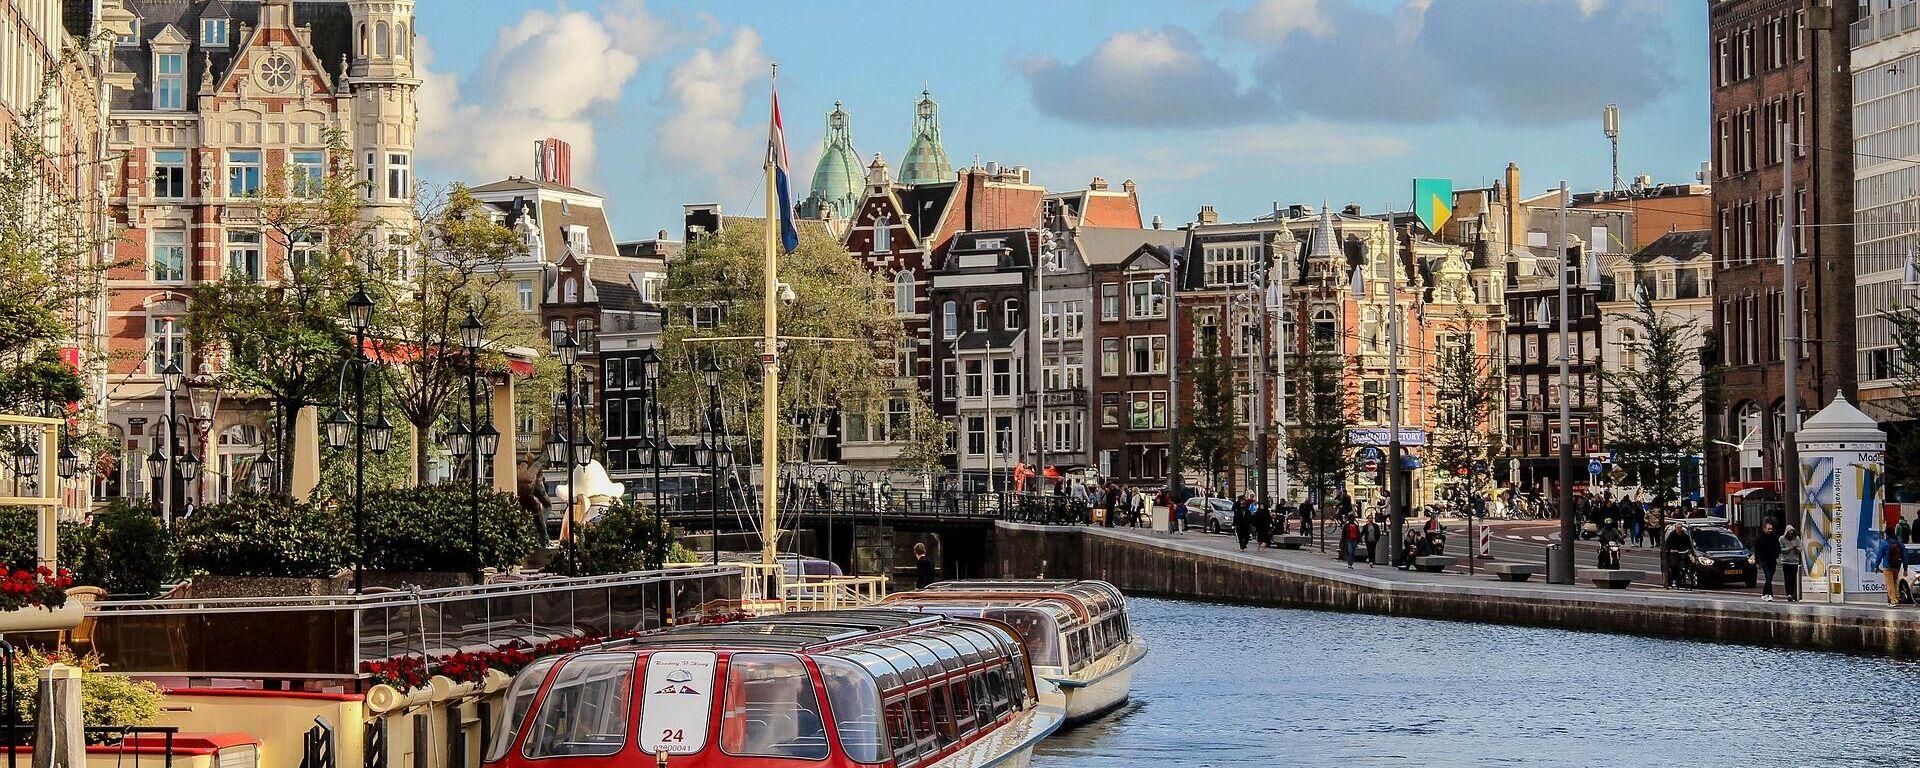 Blick auf Amsterdam (Symbolbild) - SNA, 1920, 01.07.2021